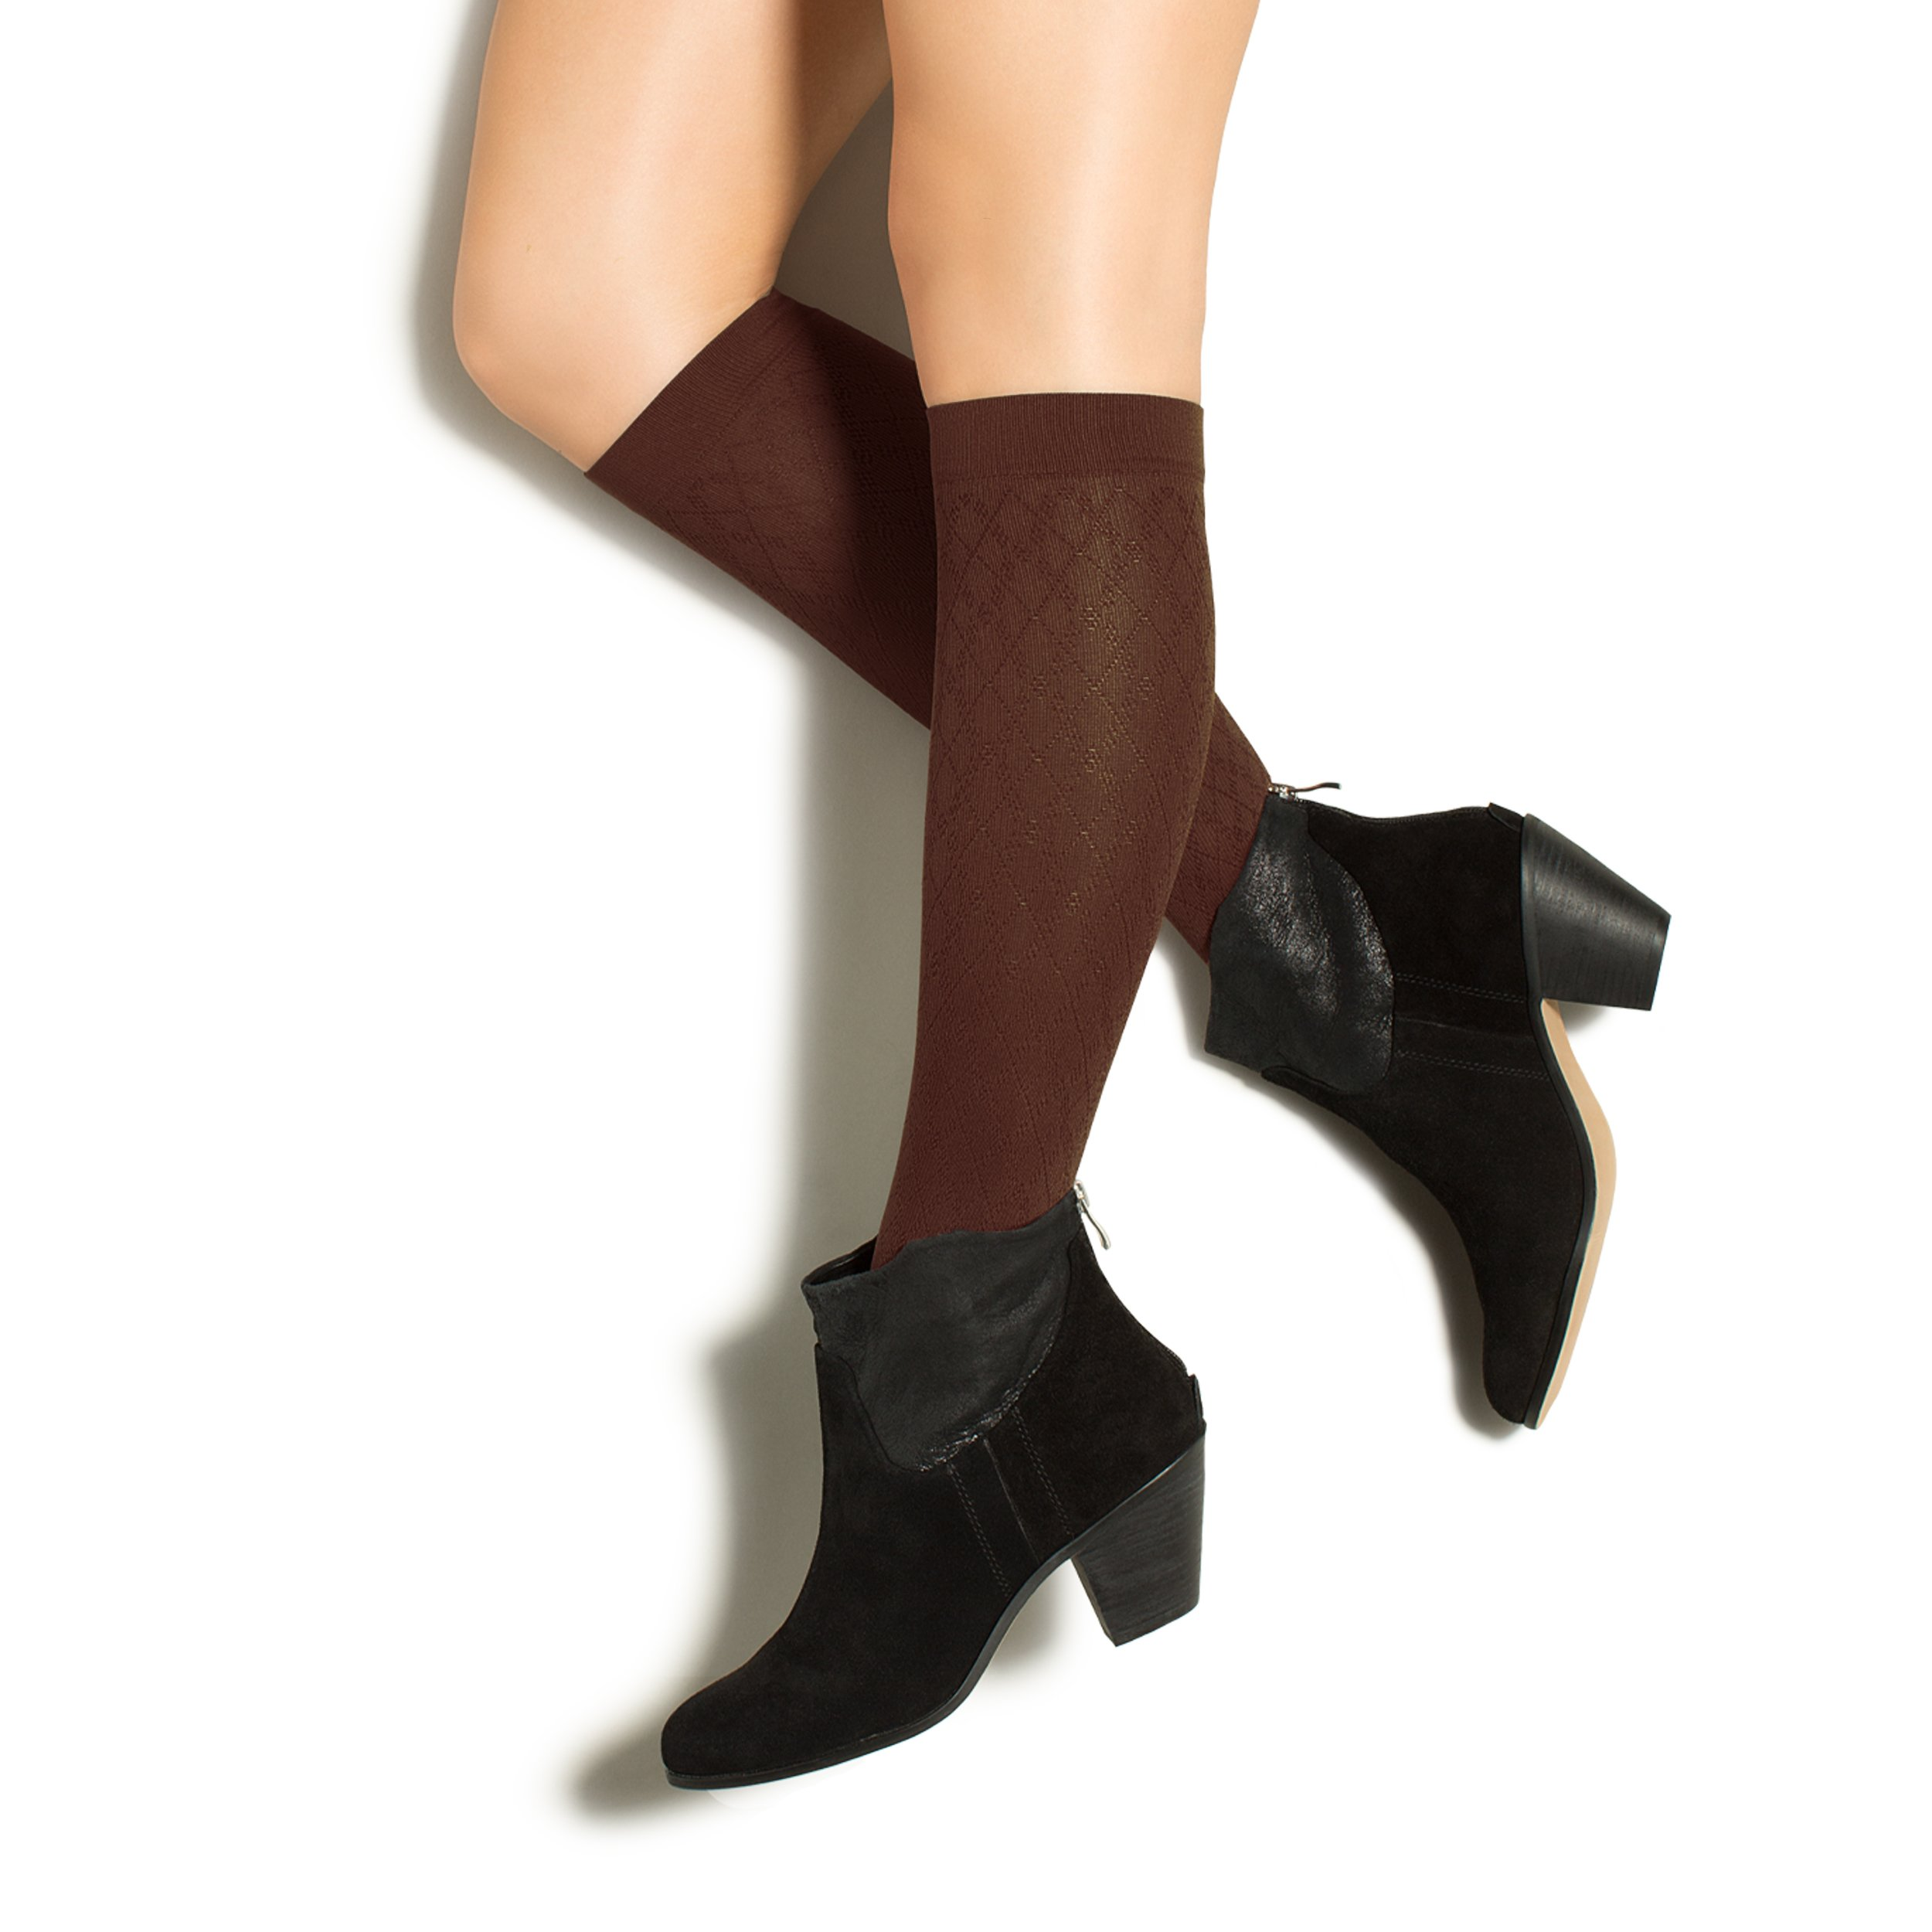 Therafirm LIGHT Women's Diamond Trouser Socks - 10-15mmHg Compression Dress Socks (Cocoa, Large)